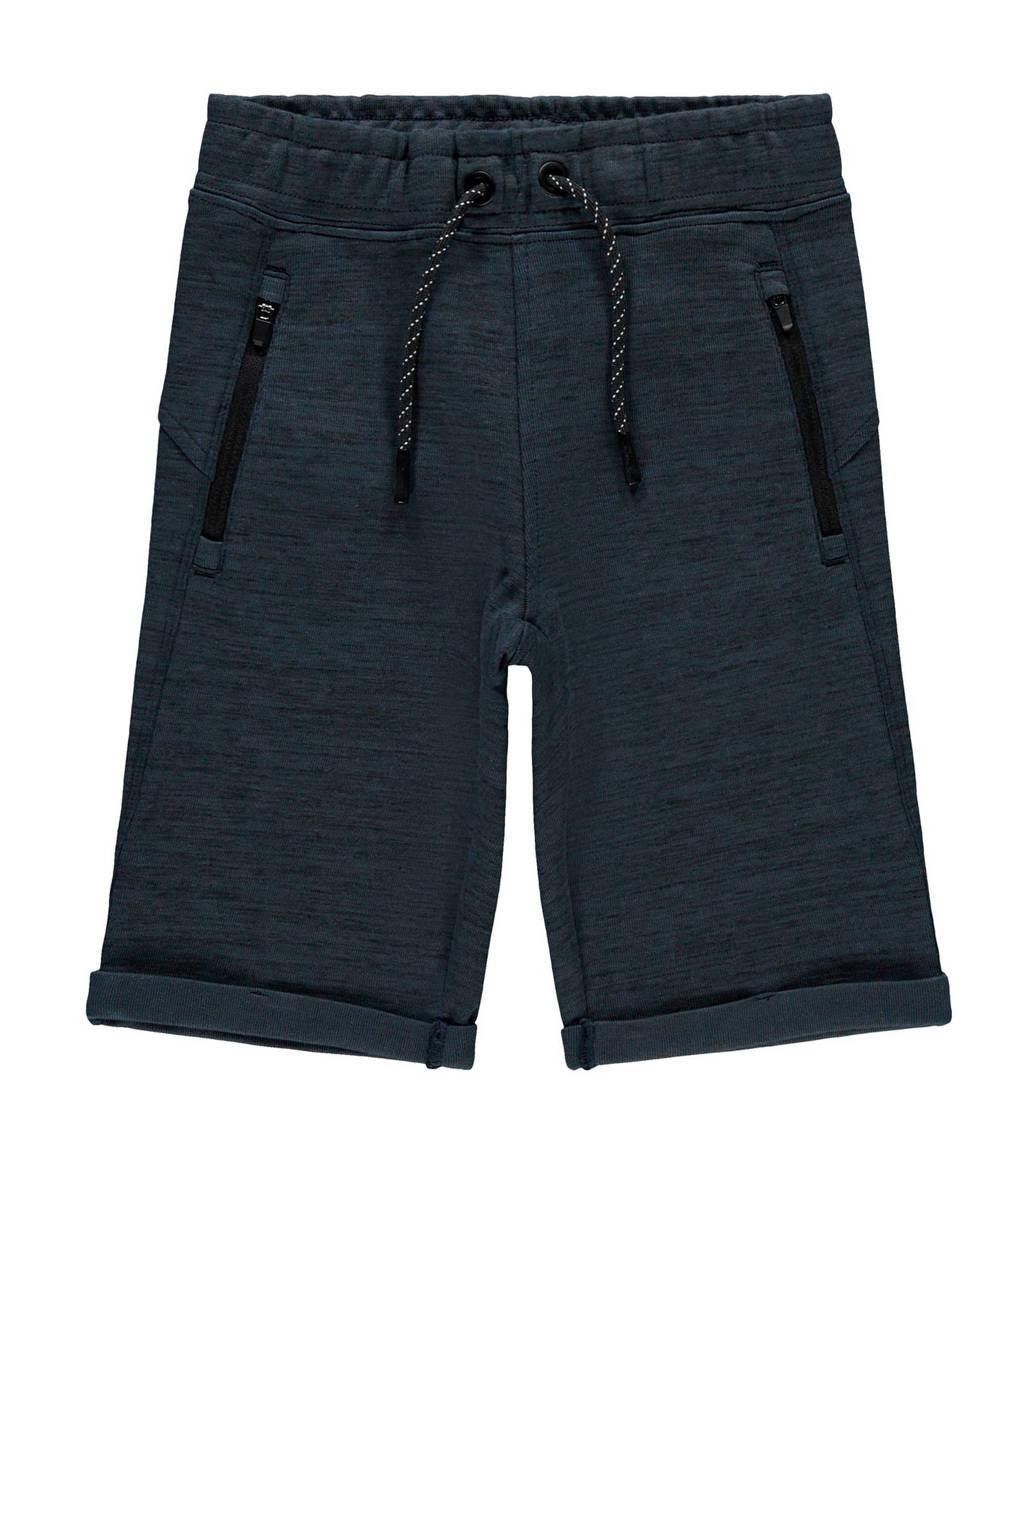 NAME IT KIDS gemêleerde sweatshort Scott donkerblauw, Donkerblauw